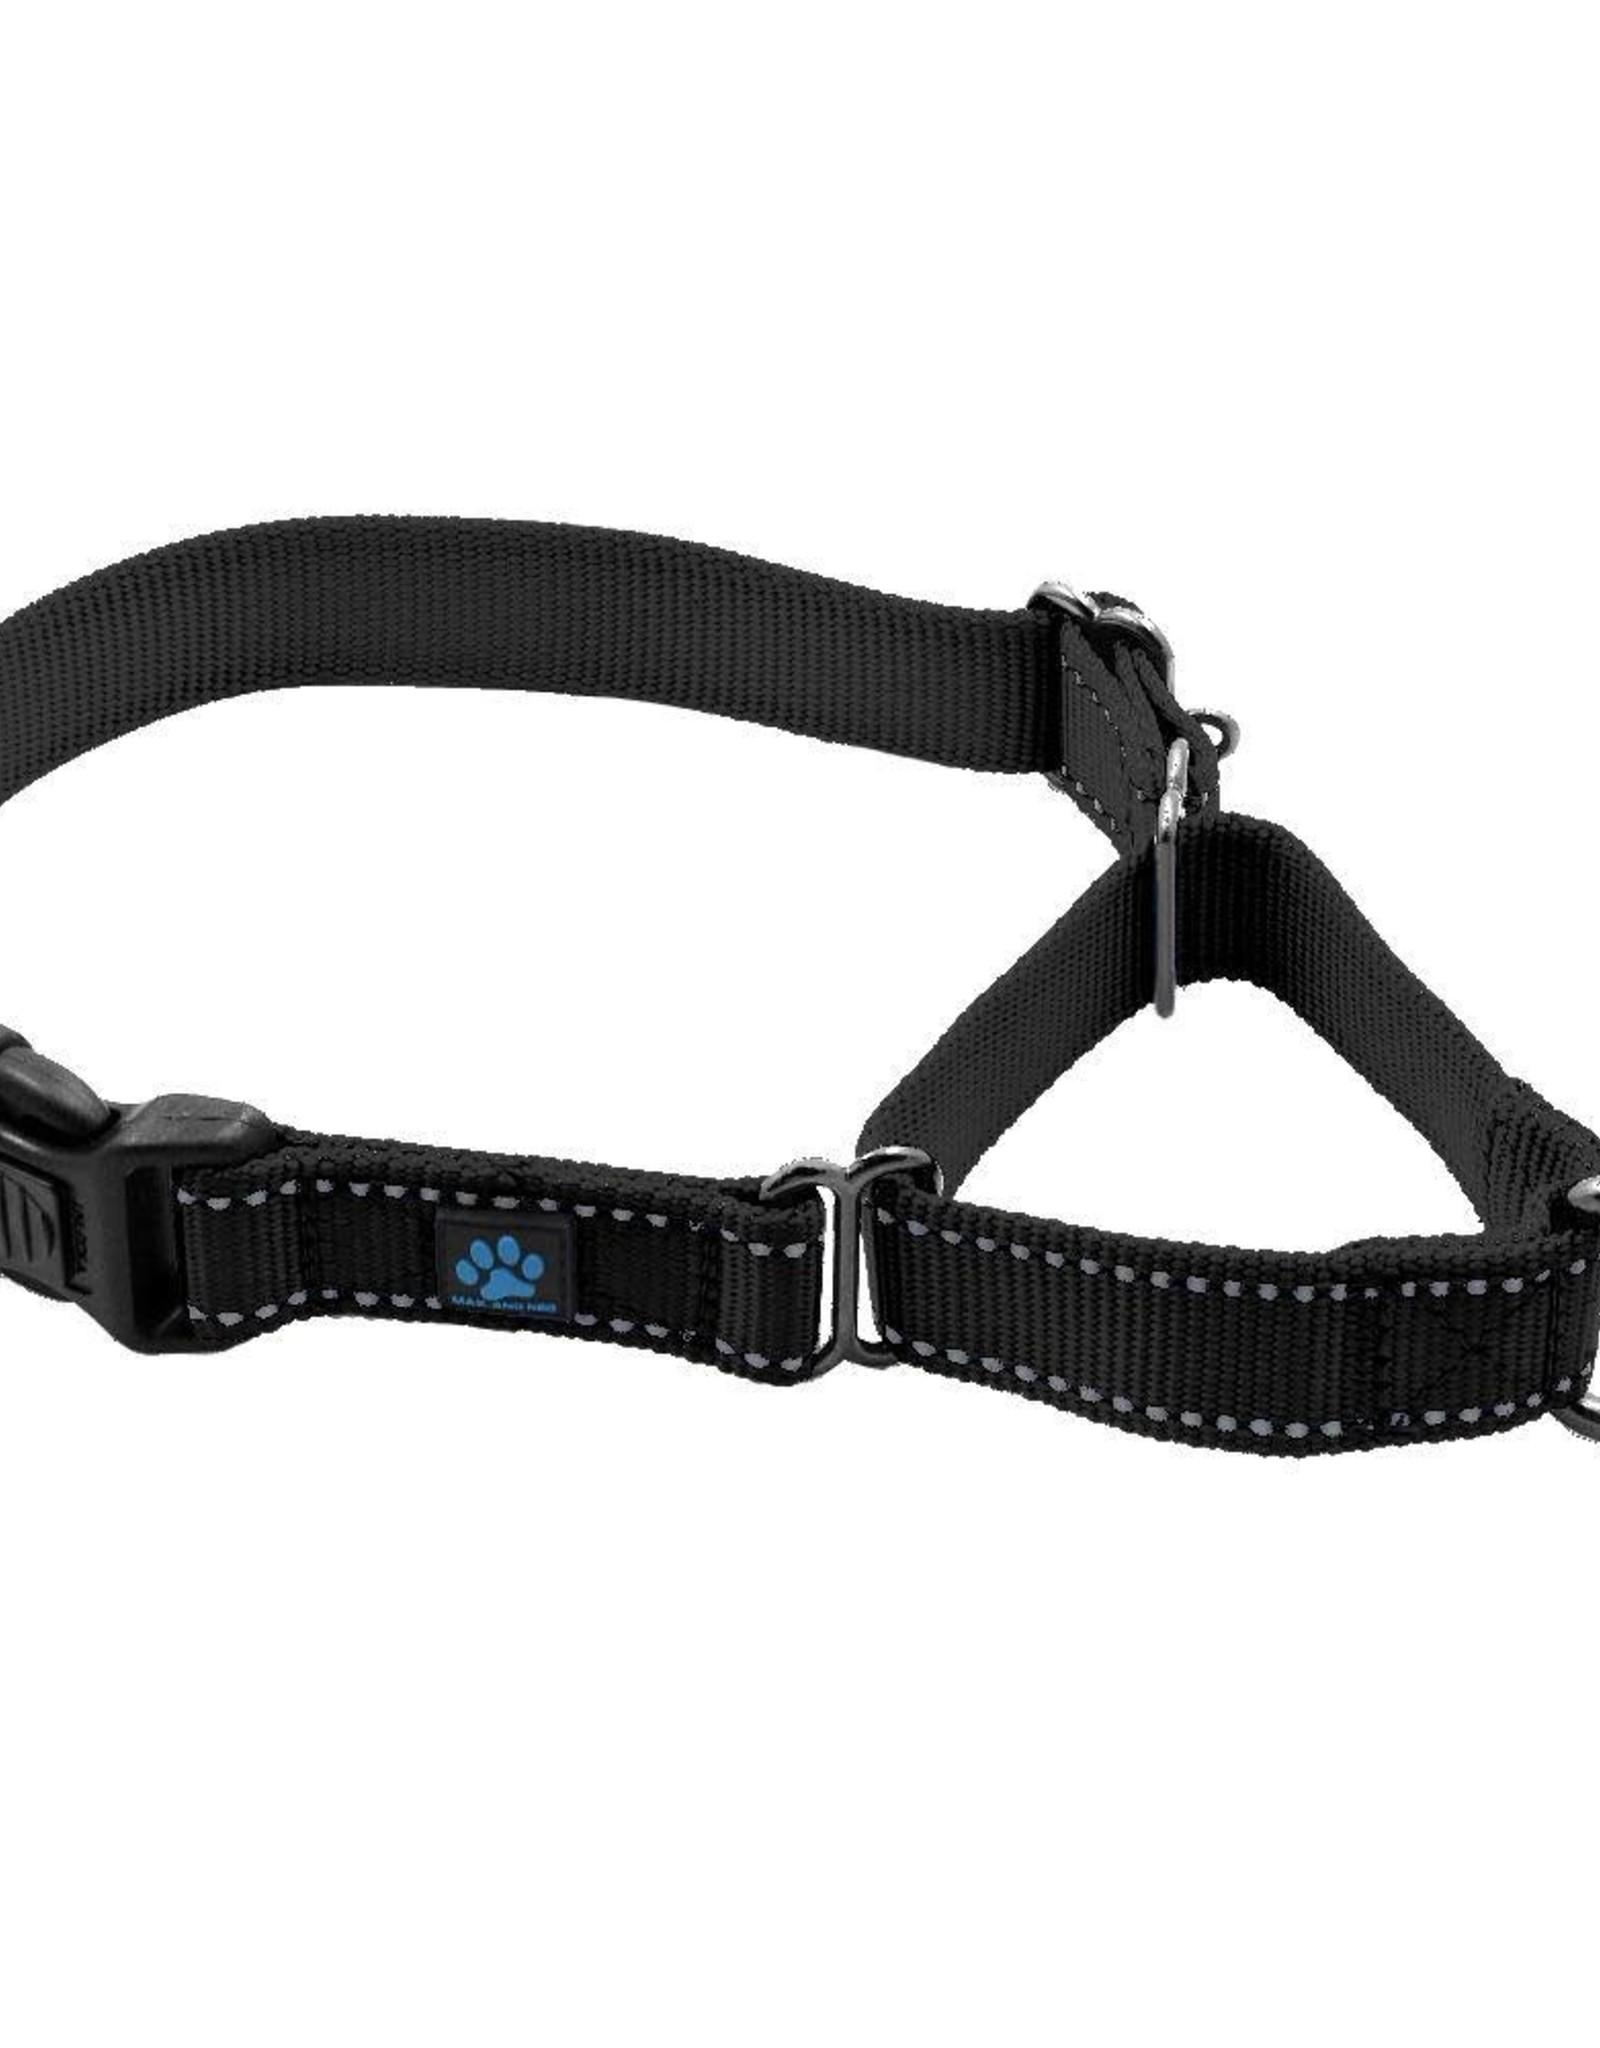 Max & Neo Max & Neo Collars - Small Black Martingale